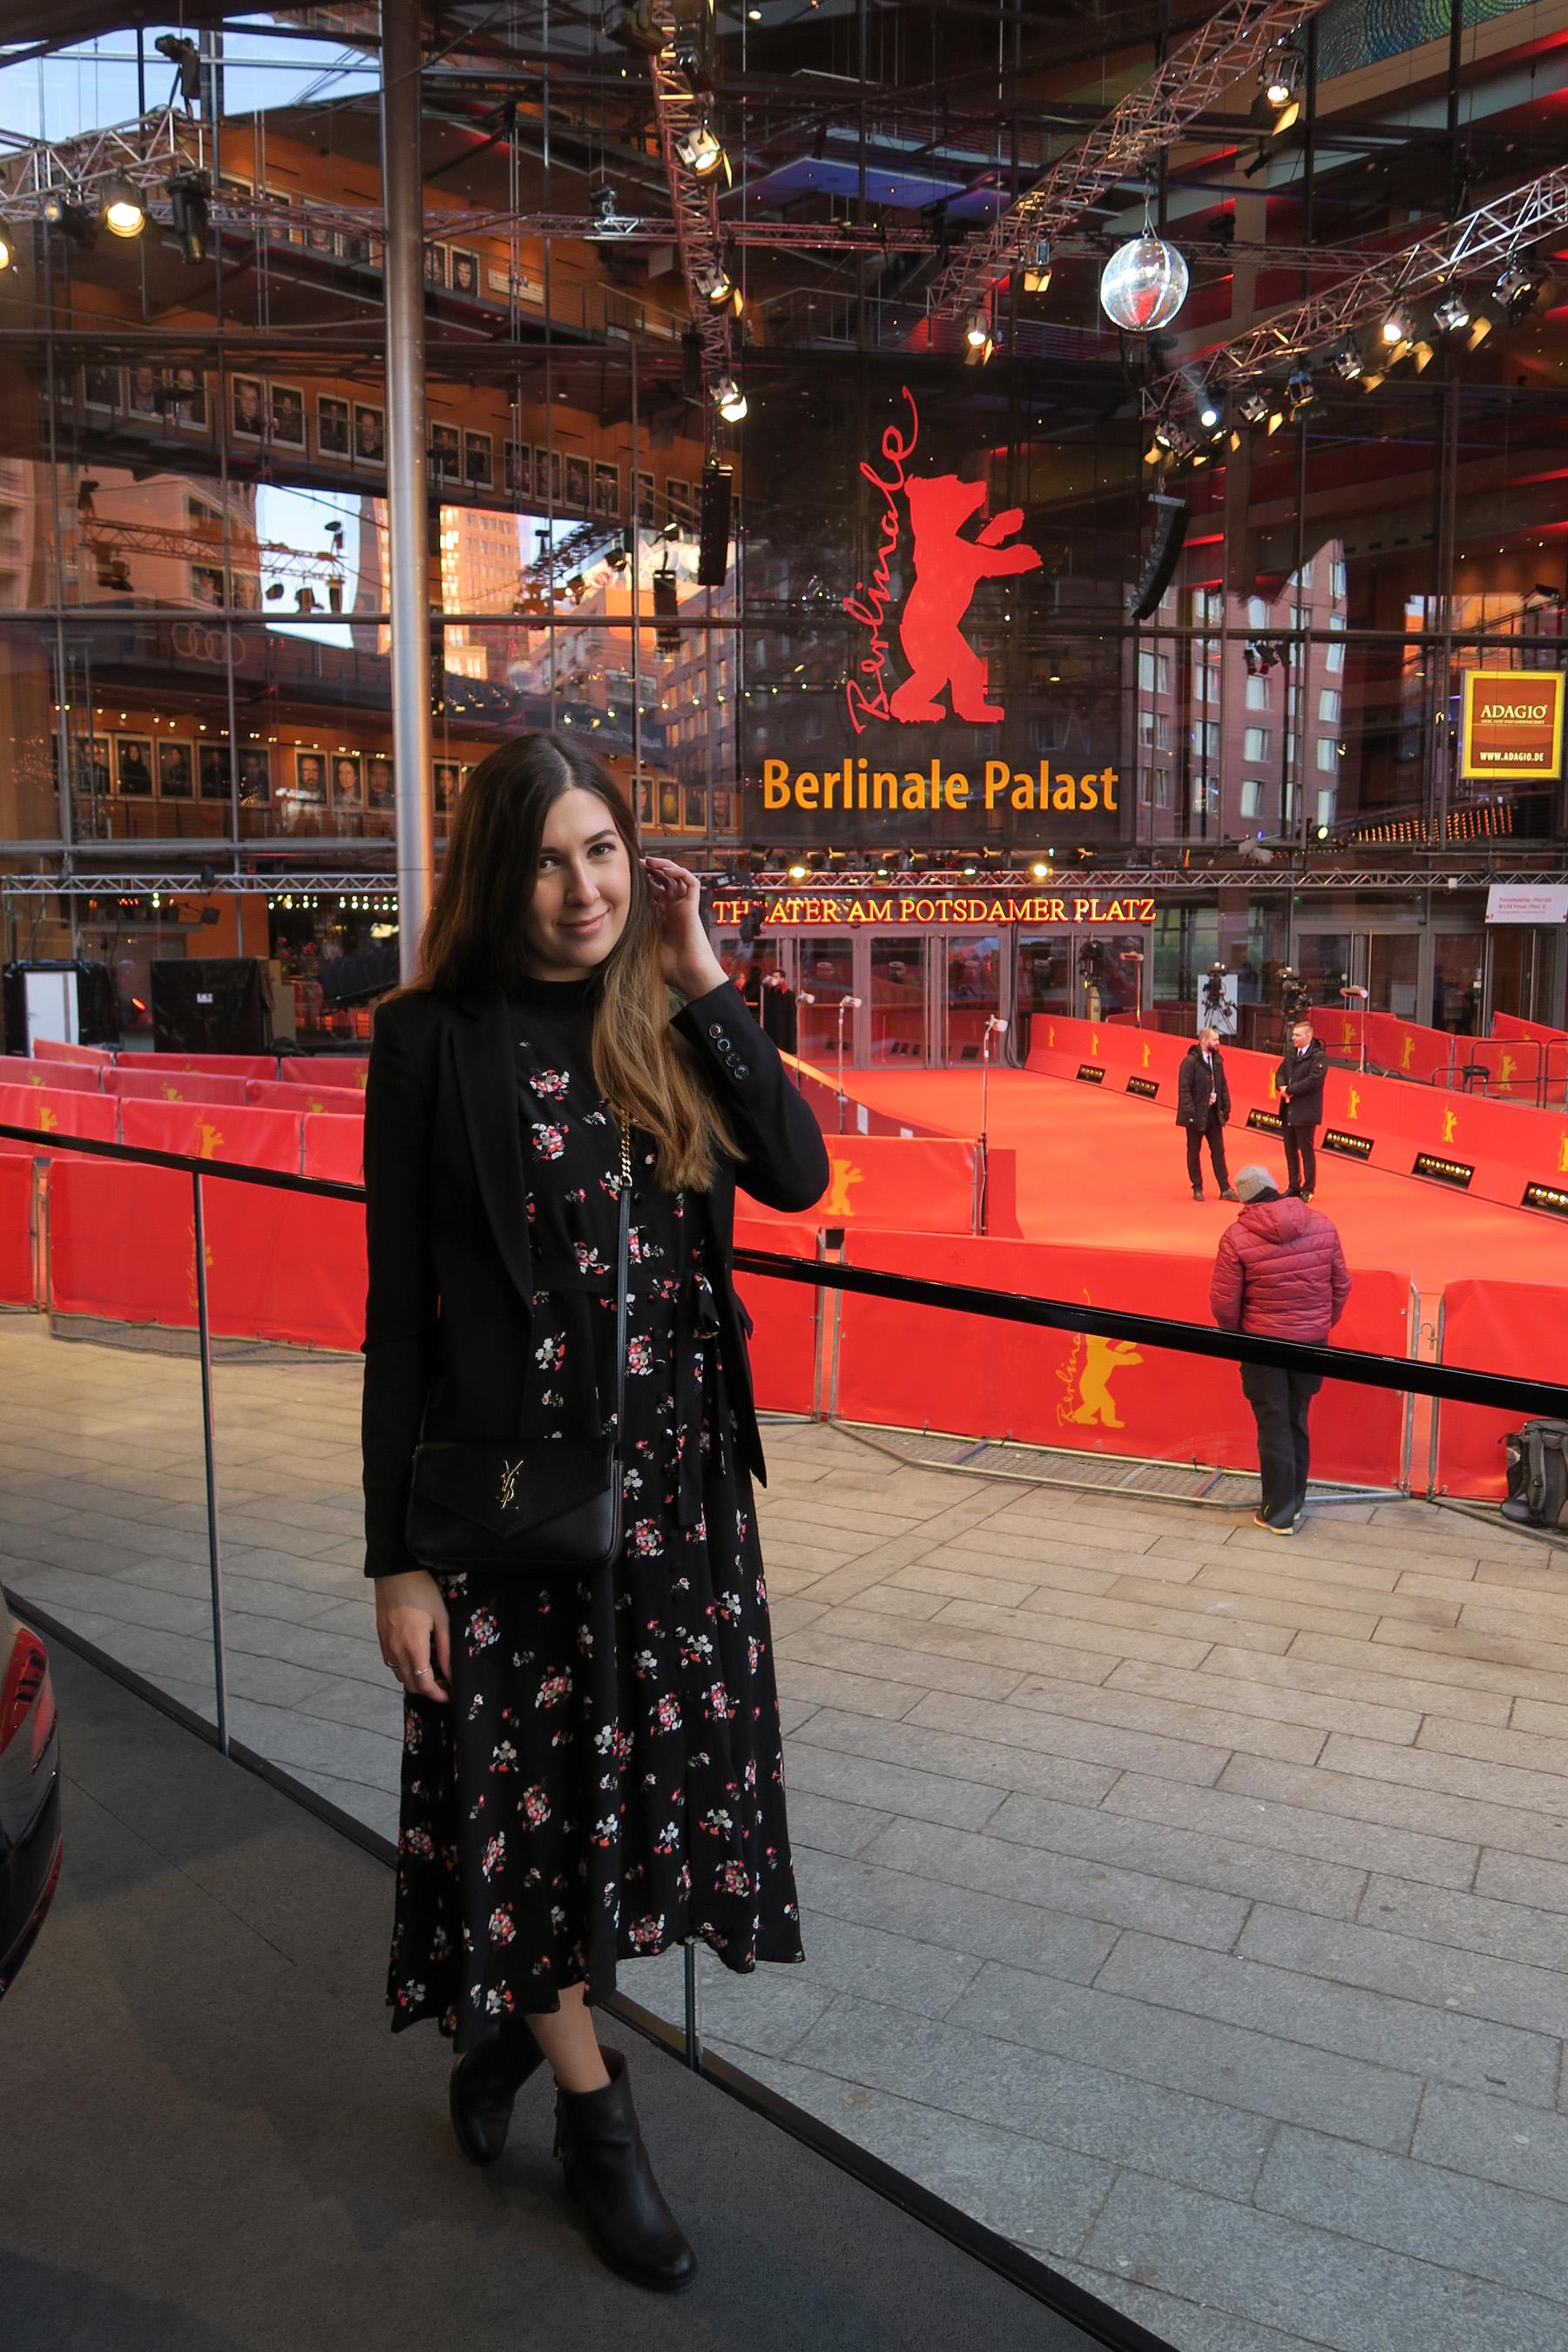 berlinale, berlin, canon, film festival, festspiele, fashionblogger, lifestyleblog, modeblogger, outfit, look, canon powershot g5x, red carpet